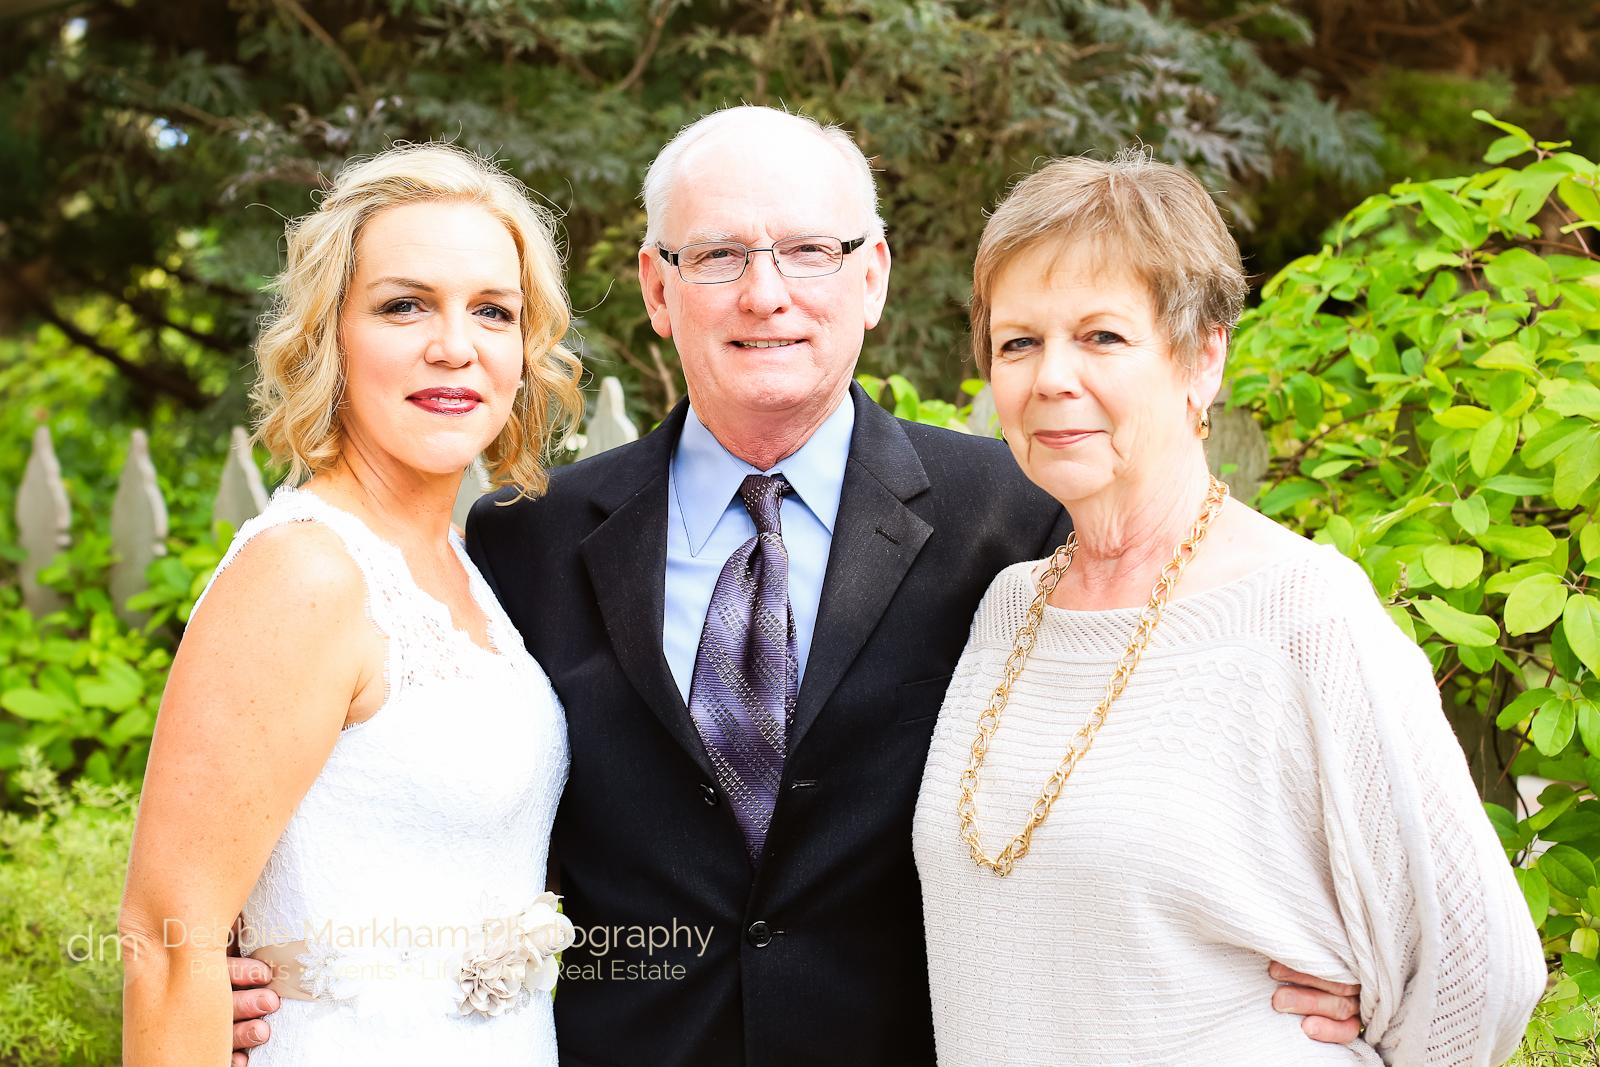 Debbie Markham Photography+Cambria Pines Lodge Wedding+Portraits+Garden Wedding+Bride Groom Portraits-5976